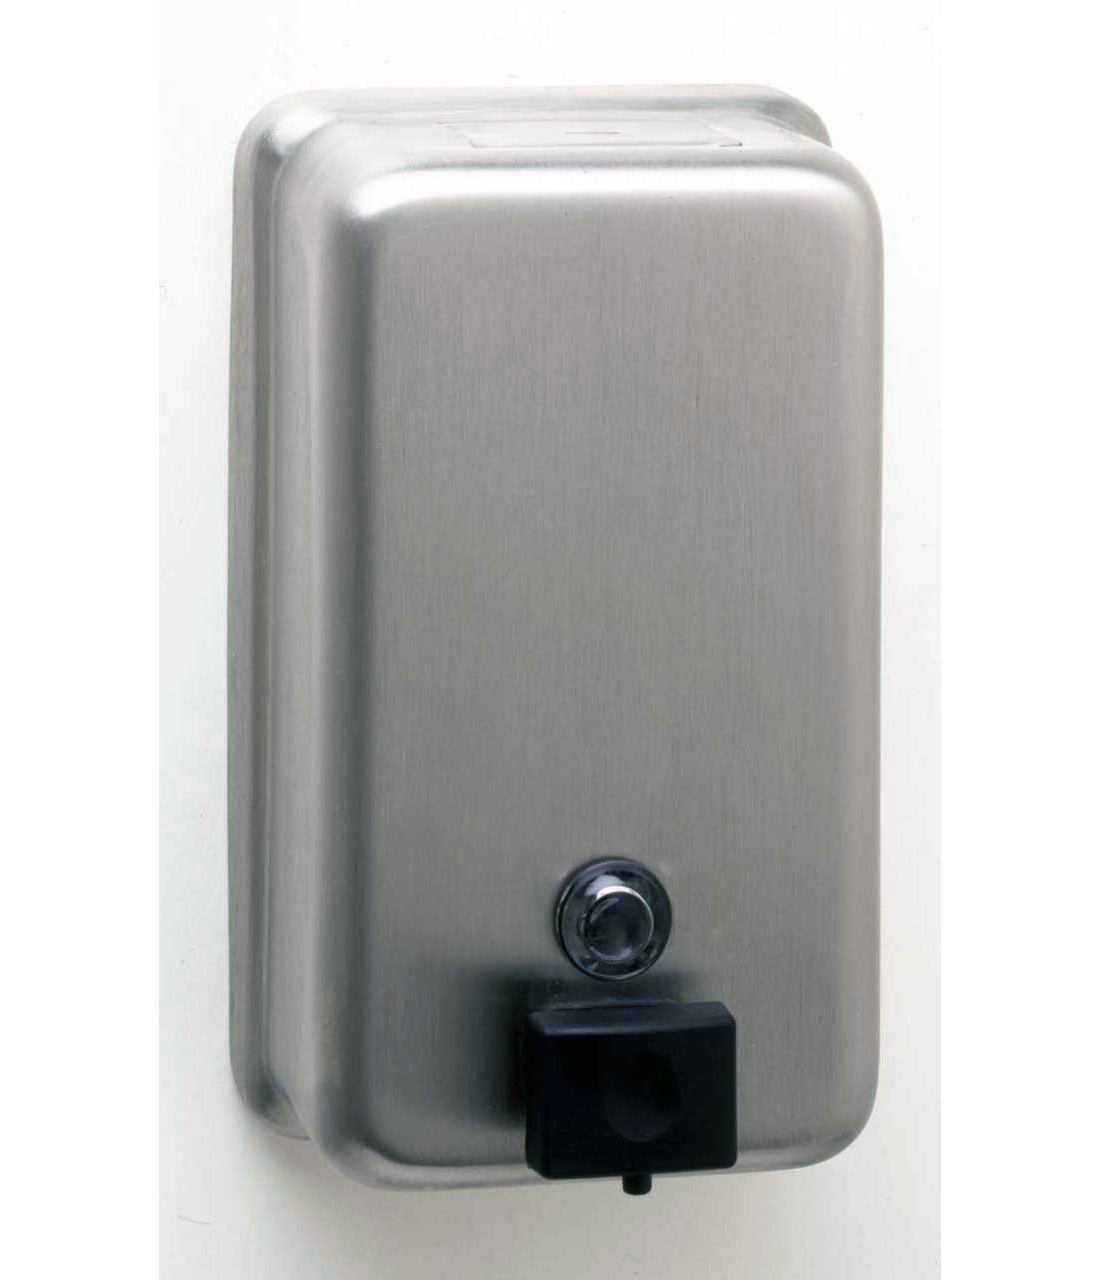 Bobrick B-2111 Surface-Mounted Vertical Soap Dispenser